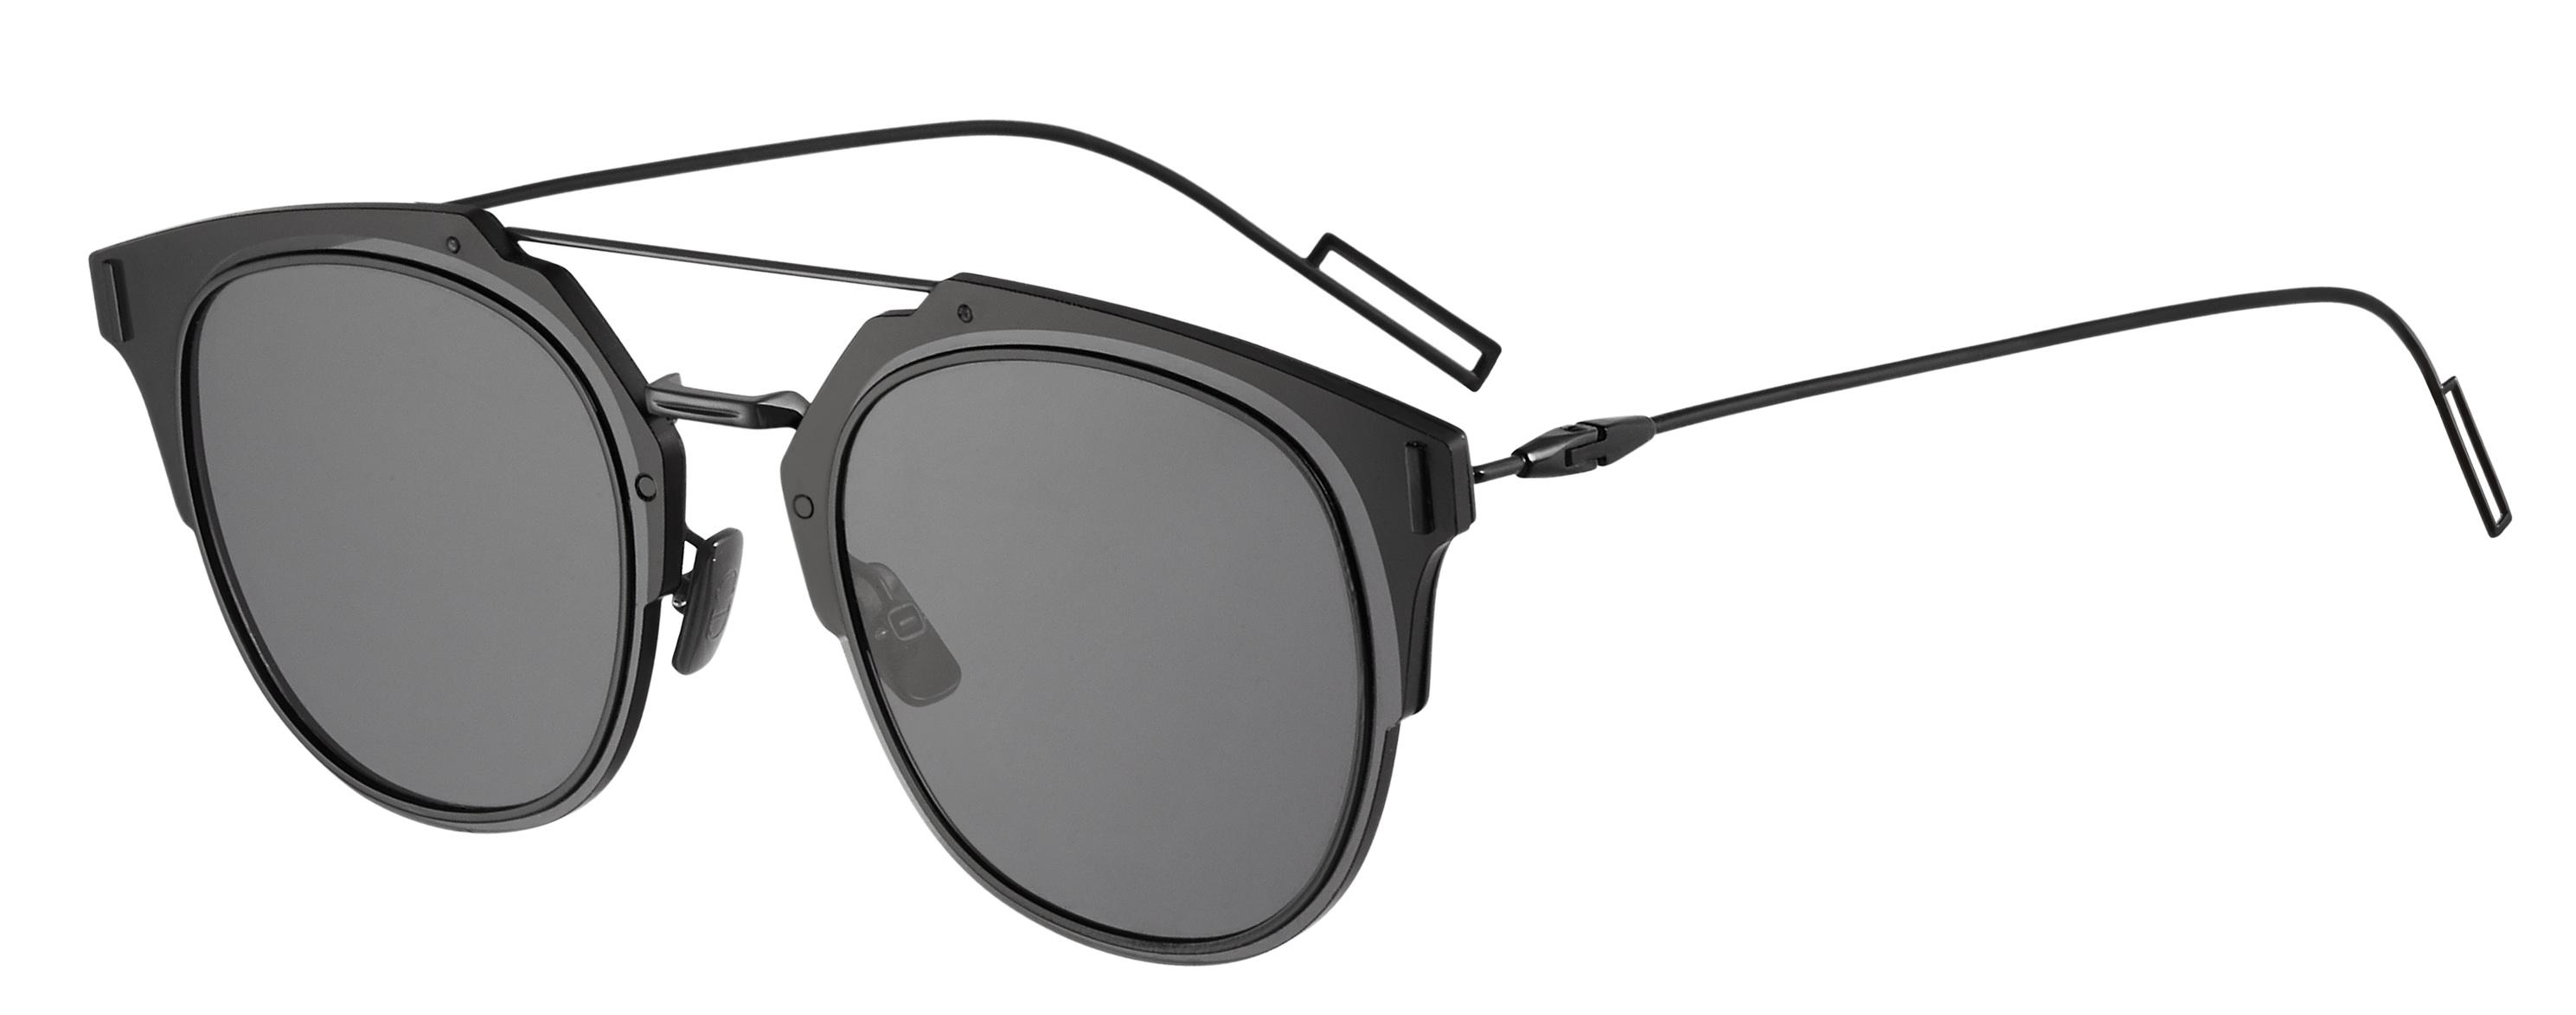 dior composit 1 0 sunglasses. Black Bedroom Furniture Sets. Home Design Ideas